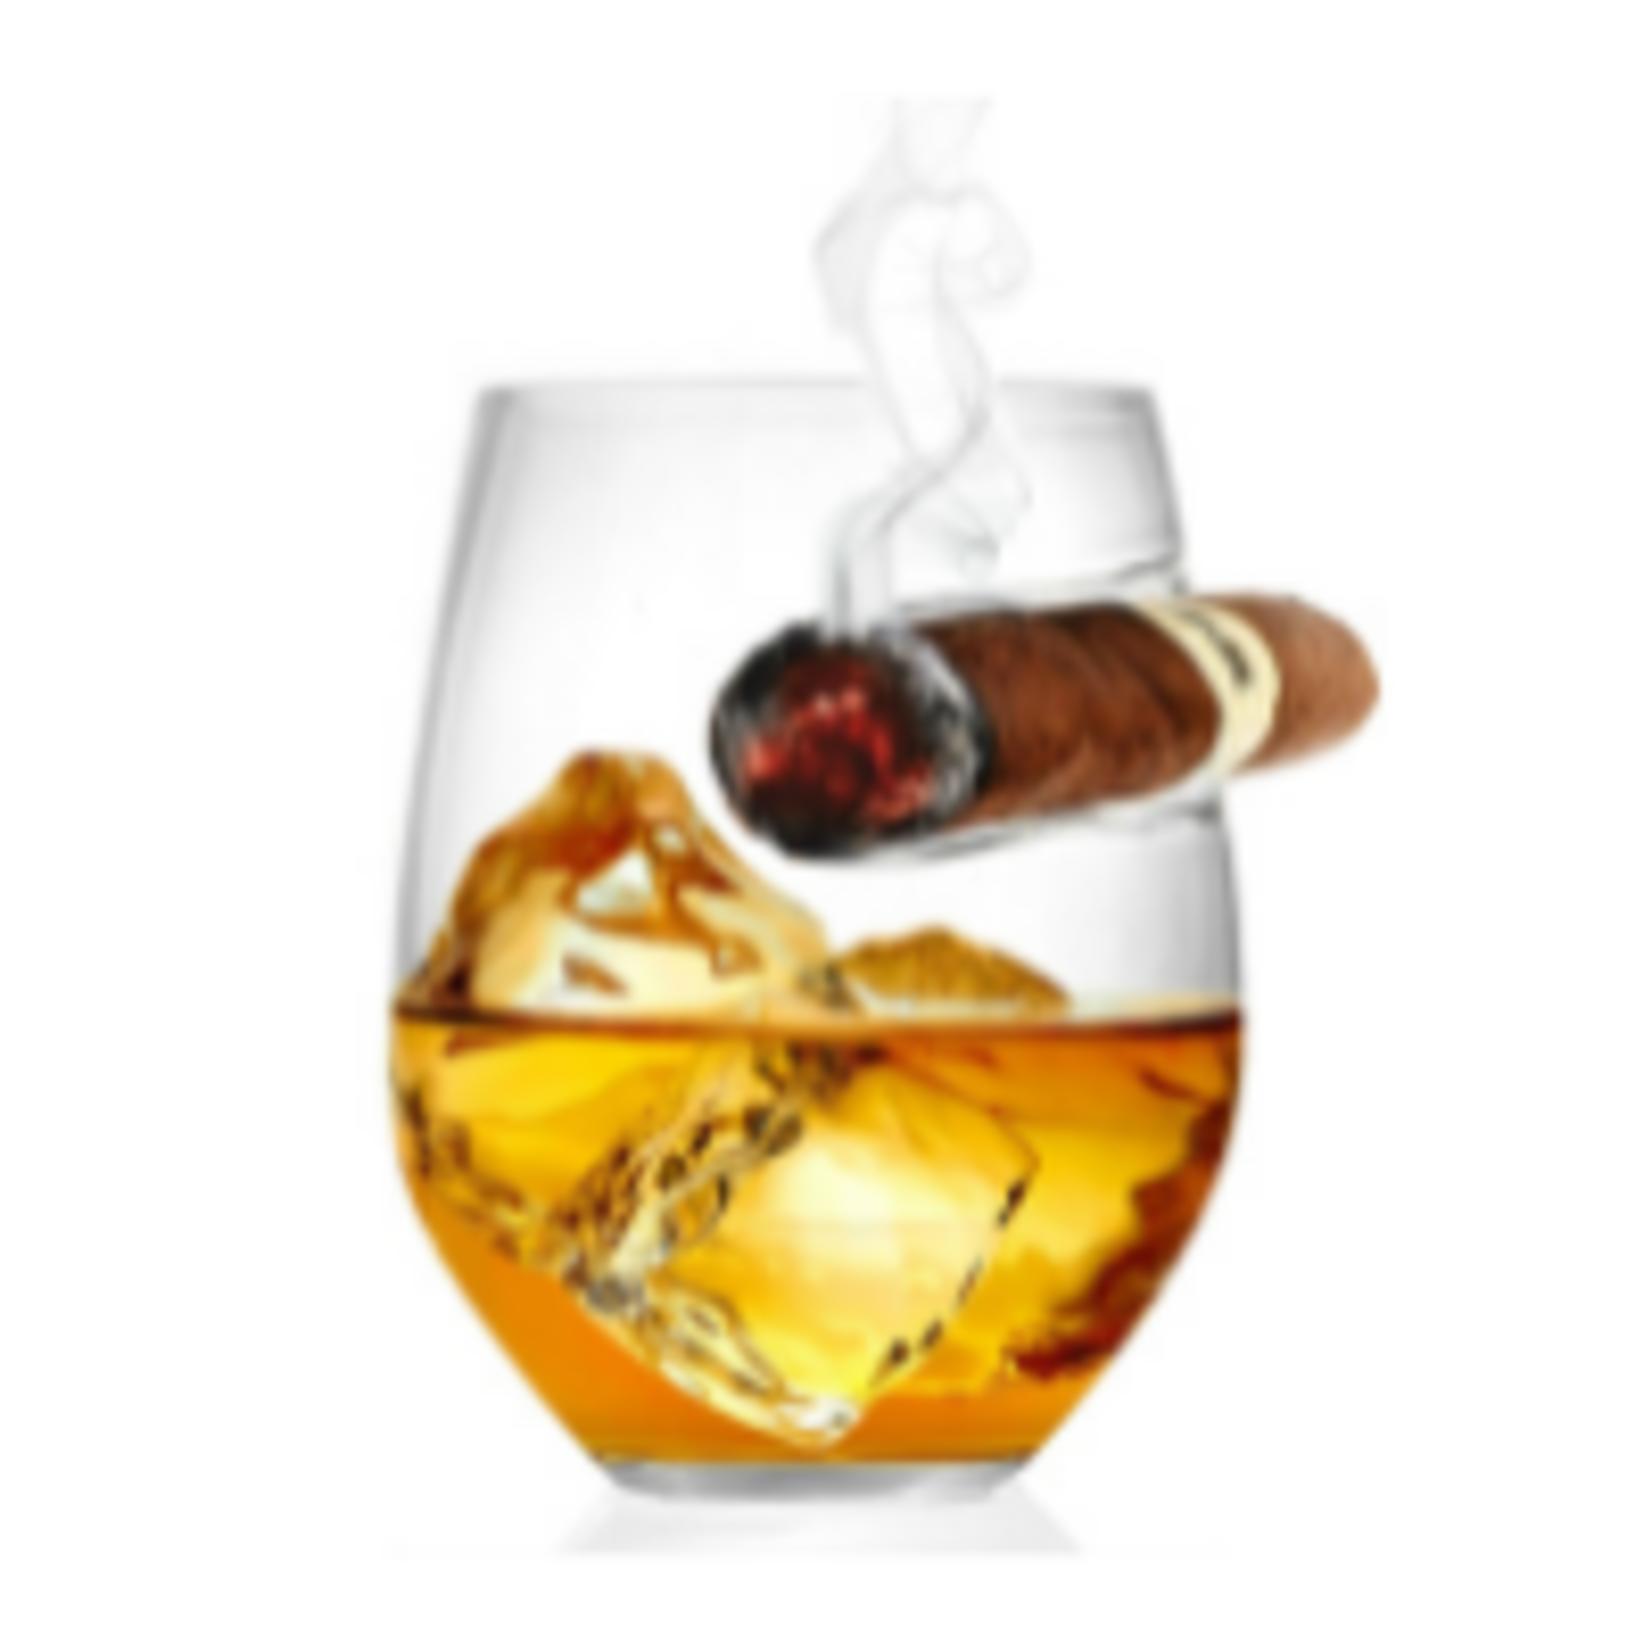 Bezrat Whiskey Glass w/ side mounted holder (set of 2)